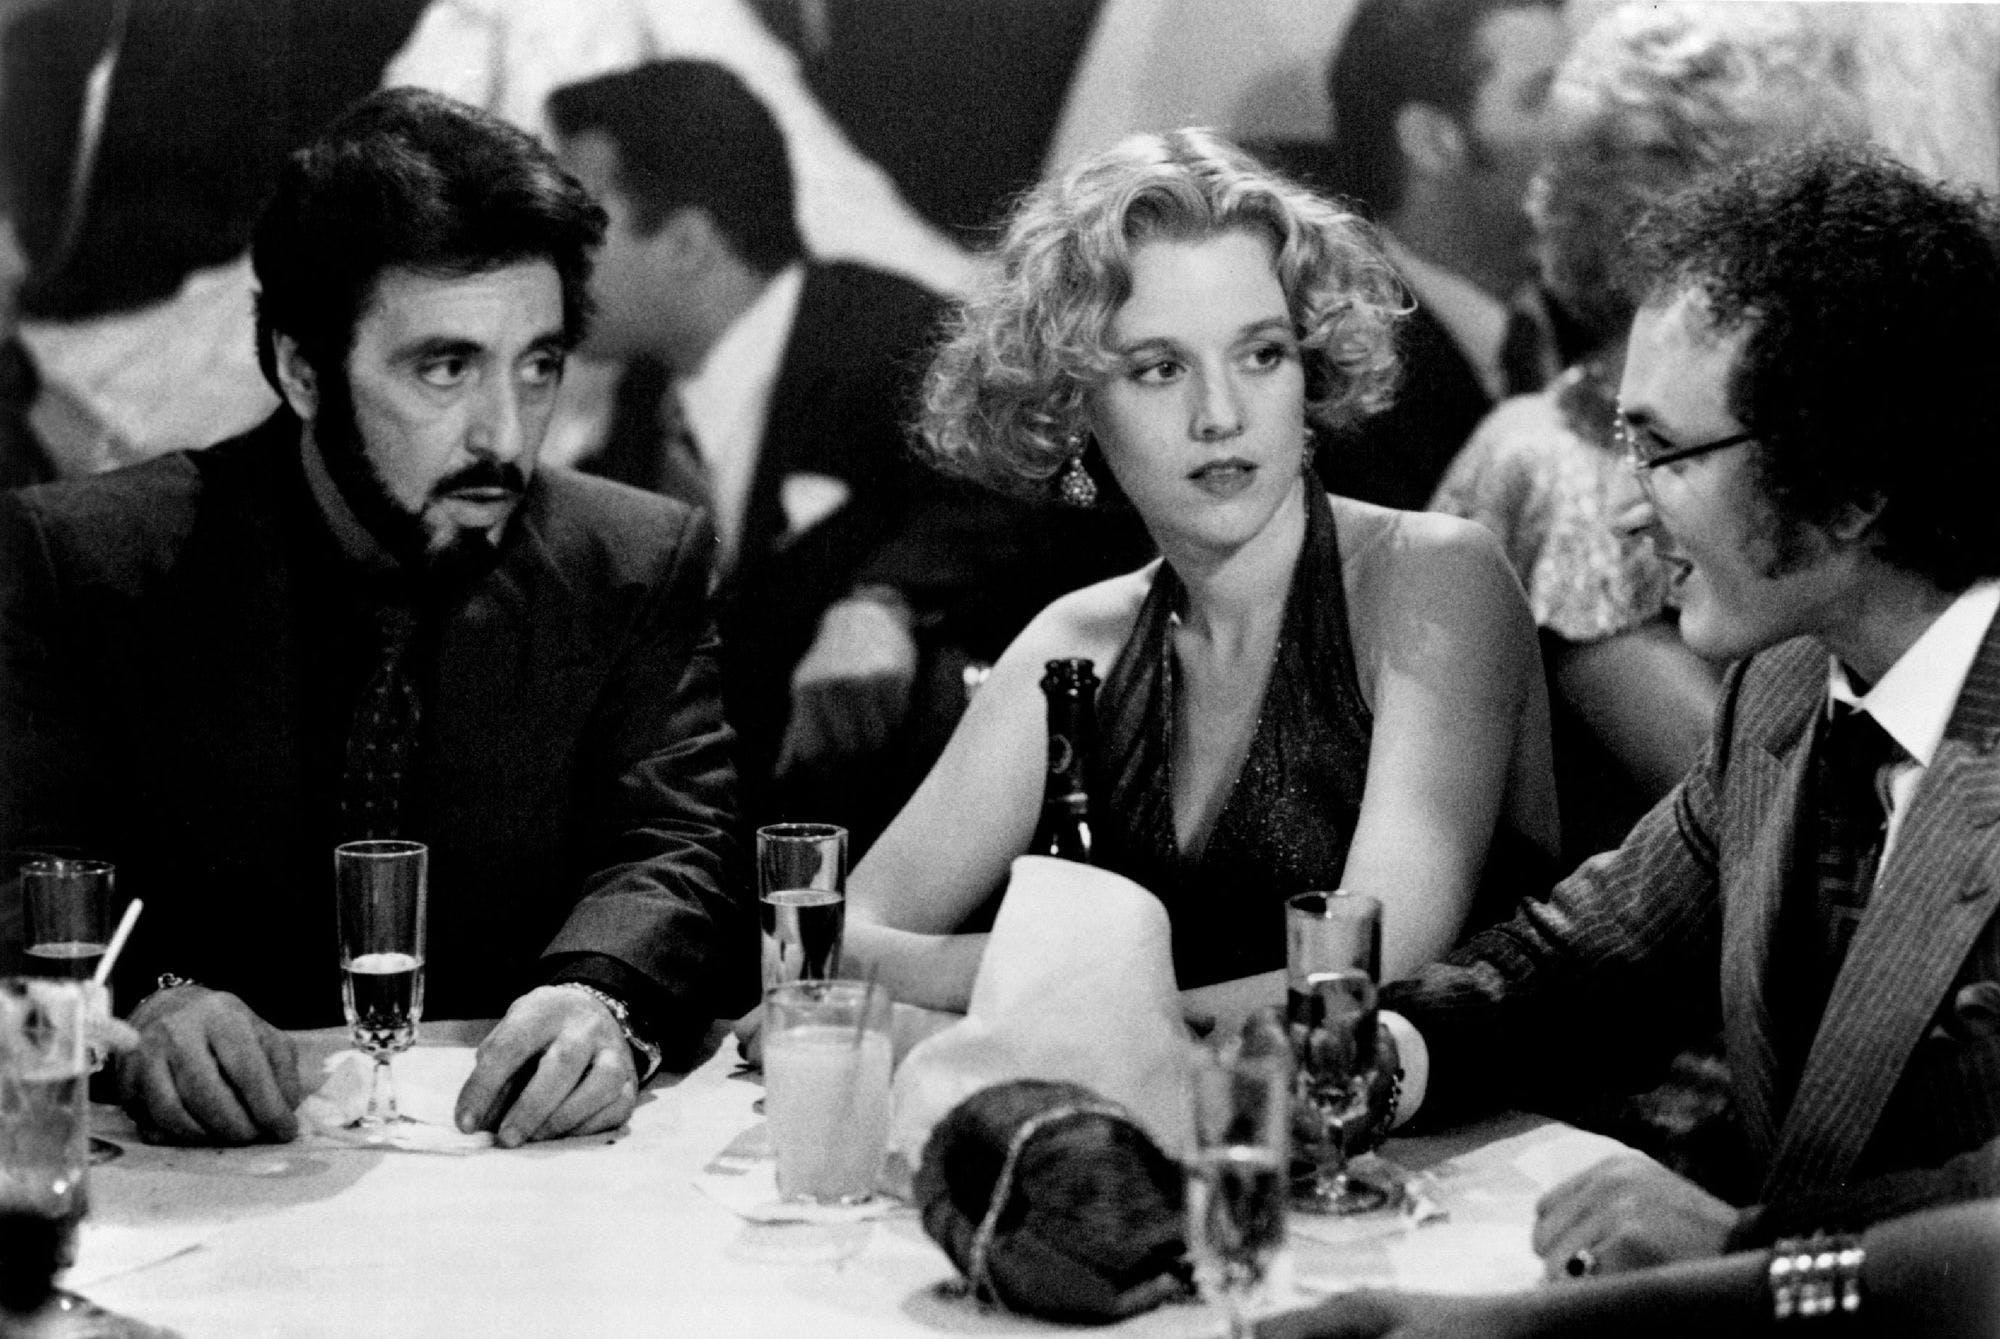 Al Pacino, Penelope Ann Miller and Sean Penn in